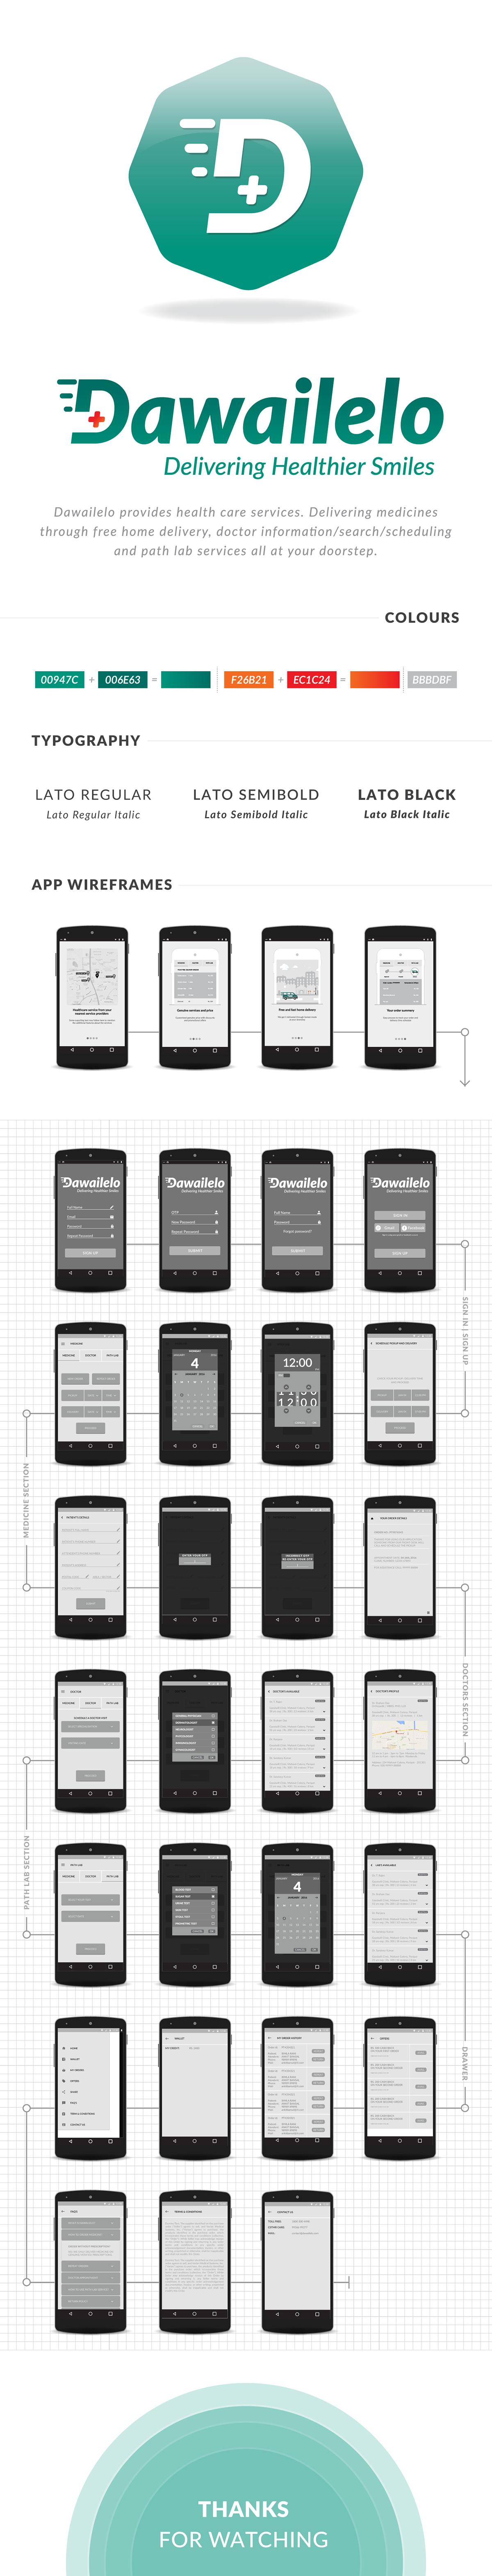 user interface wireframe brand identity